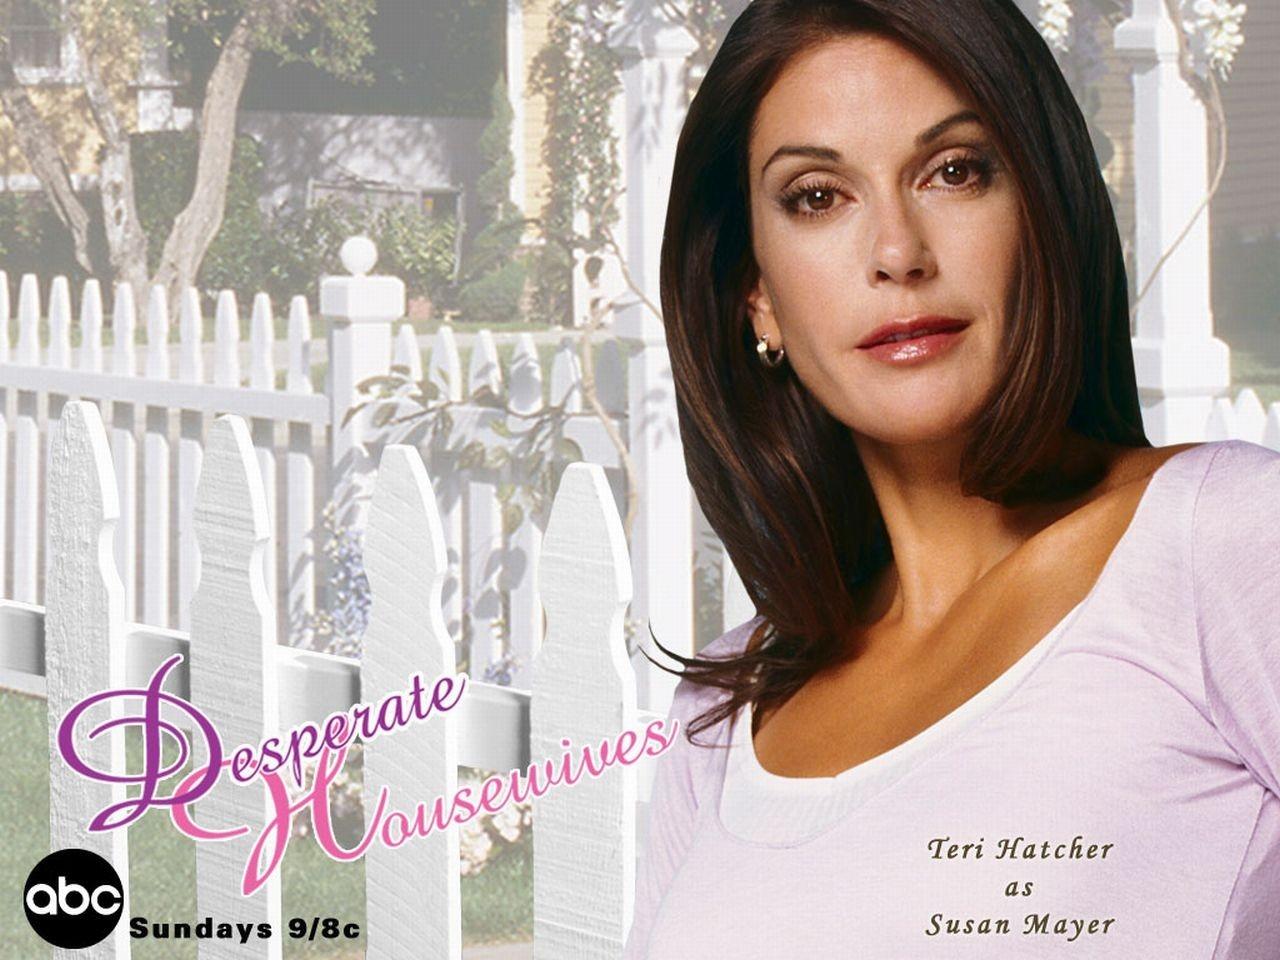 Wallpaper della serie Desperate Housewives con Susan Mayer (Teri Hatcher)